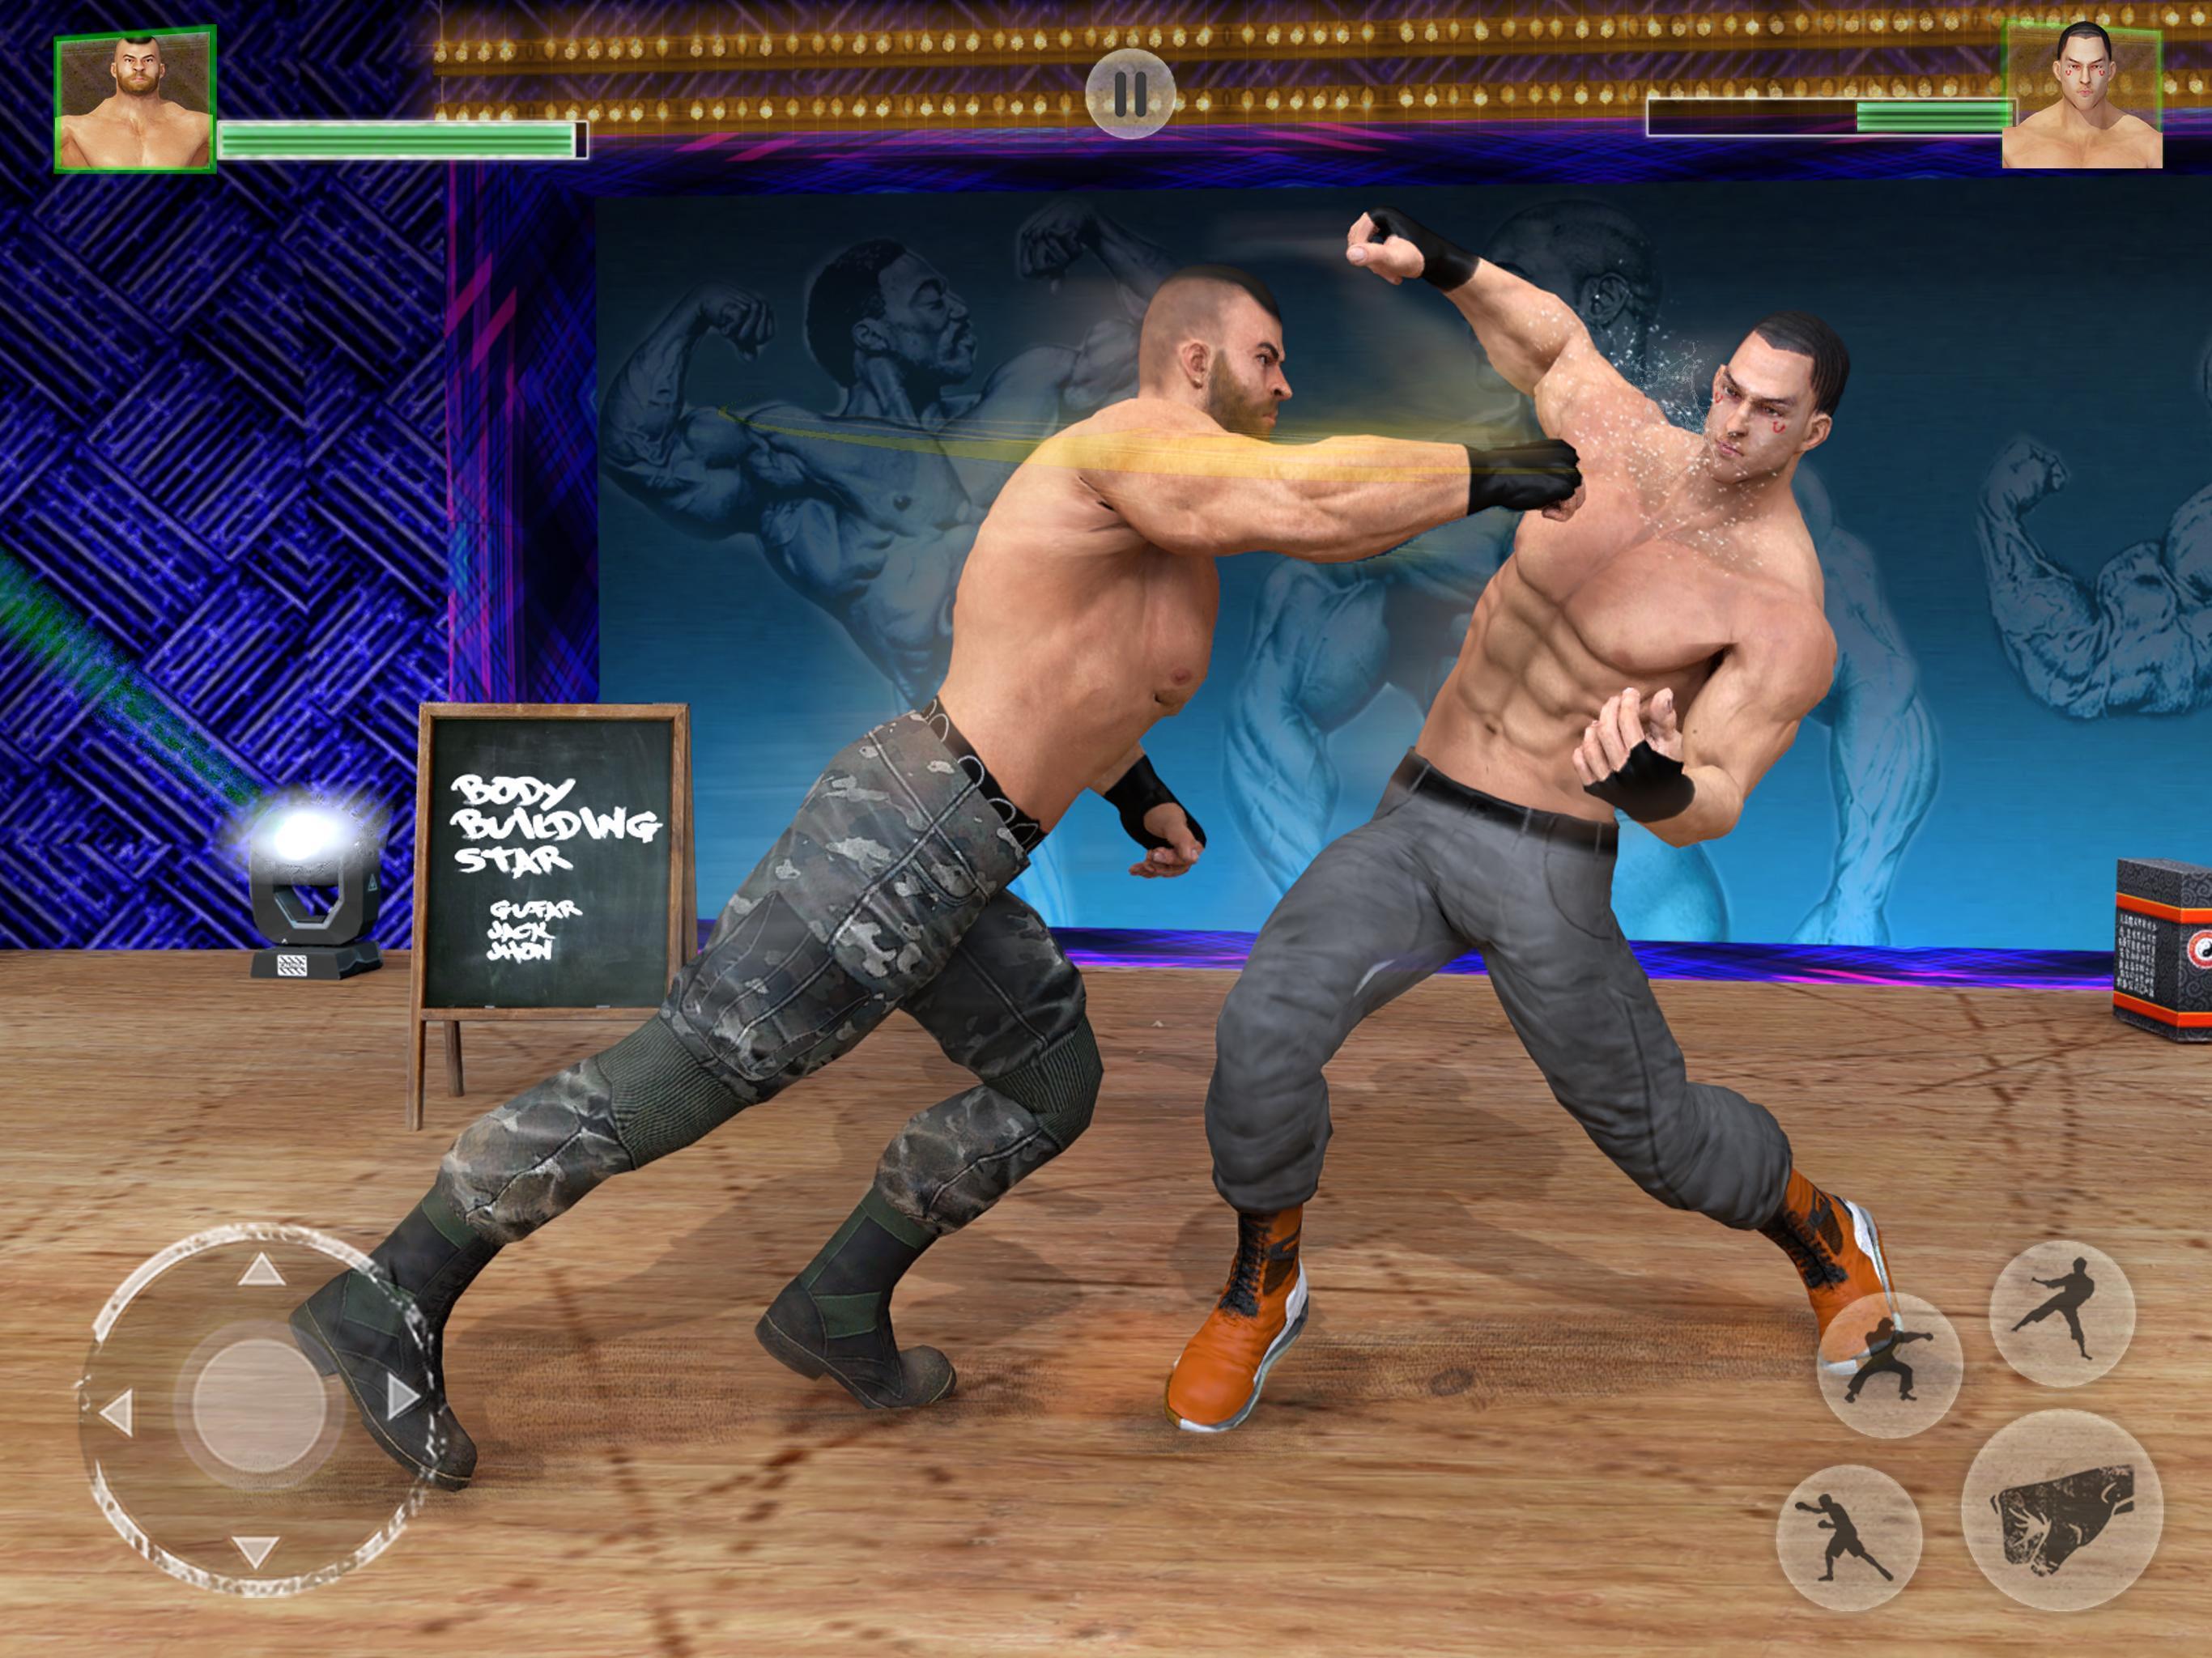 Bodybuilder Fighting Club 2019: Wrestling Games 1.1.4 Screenshot 10